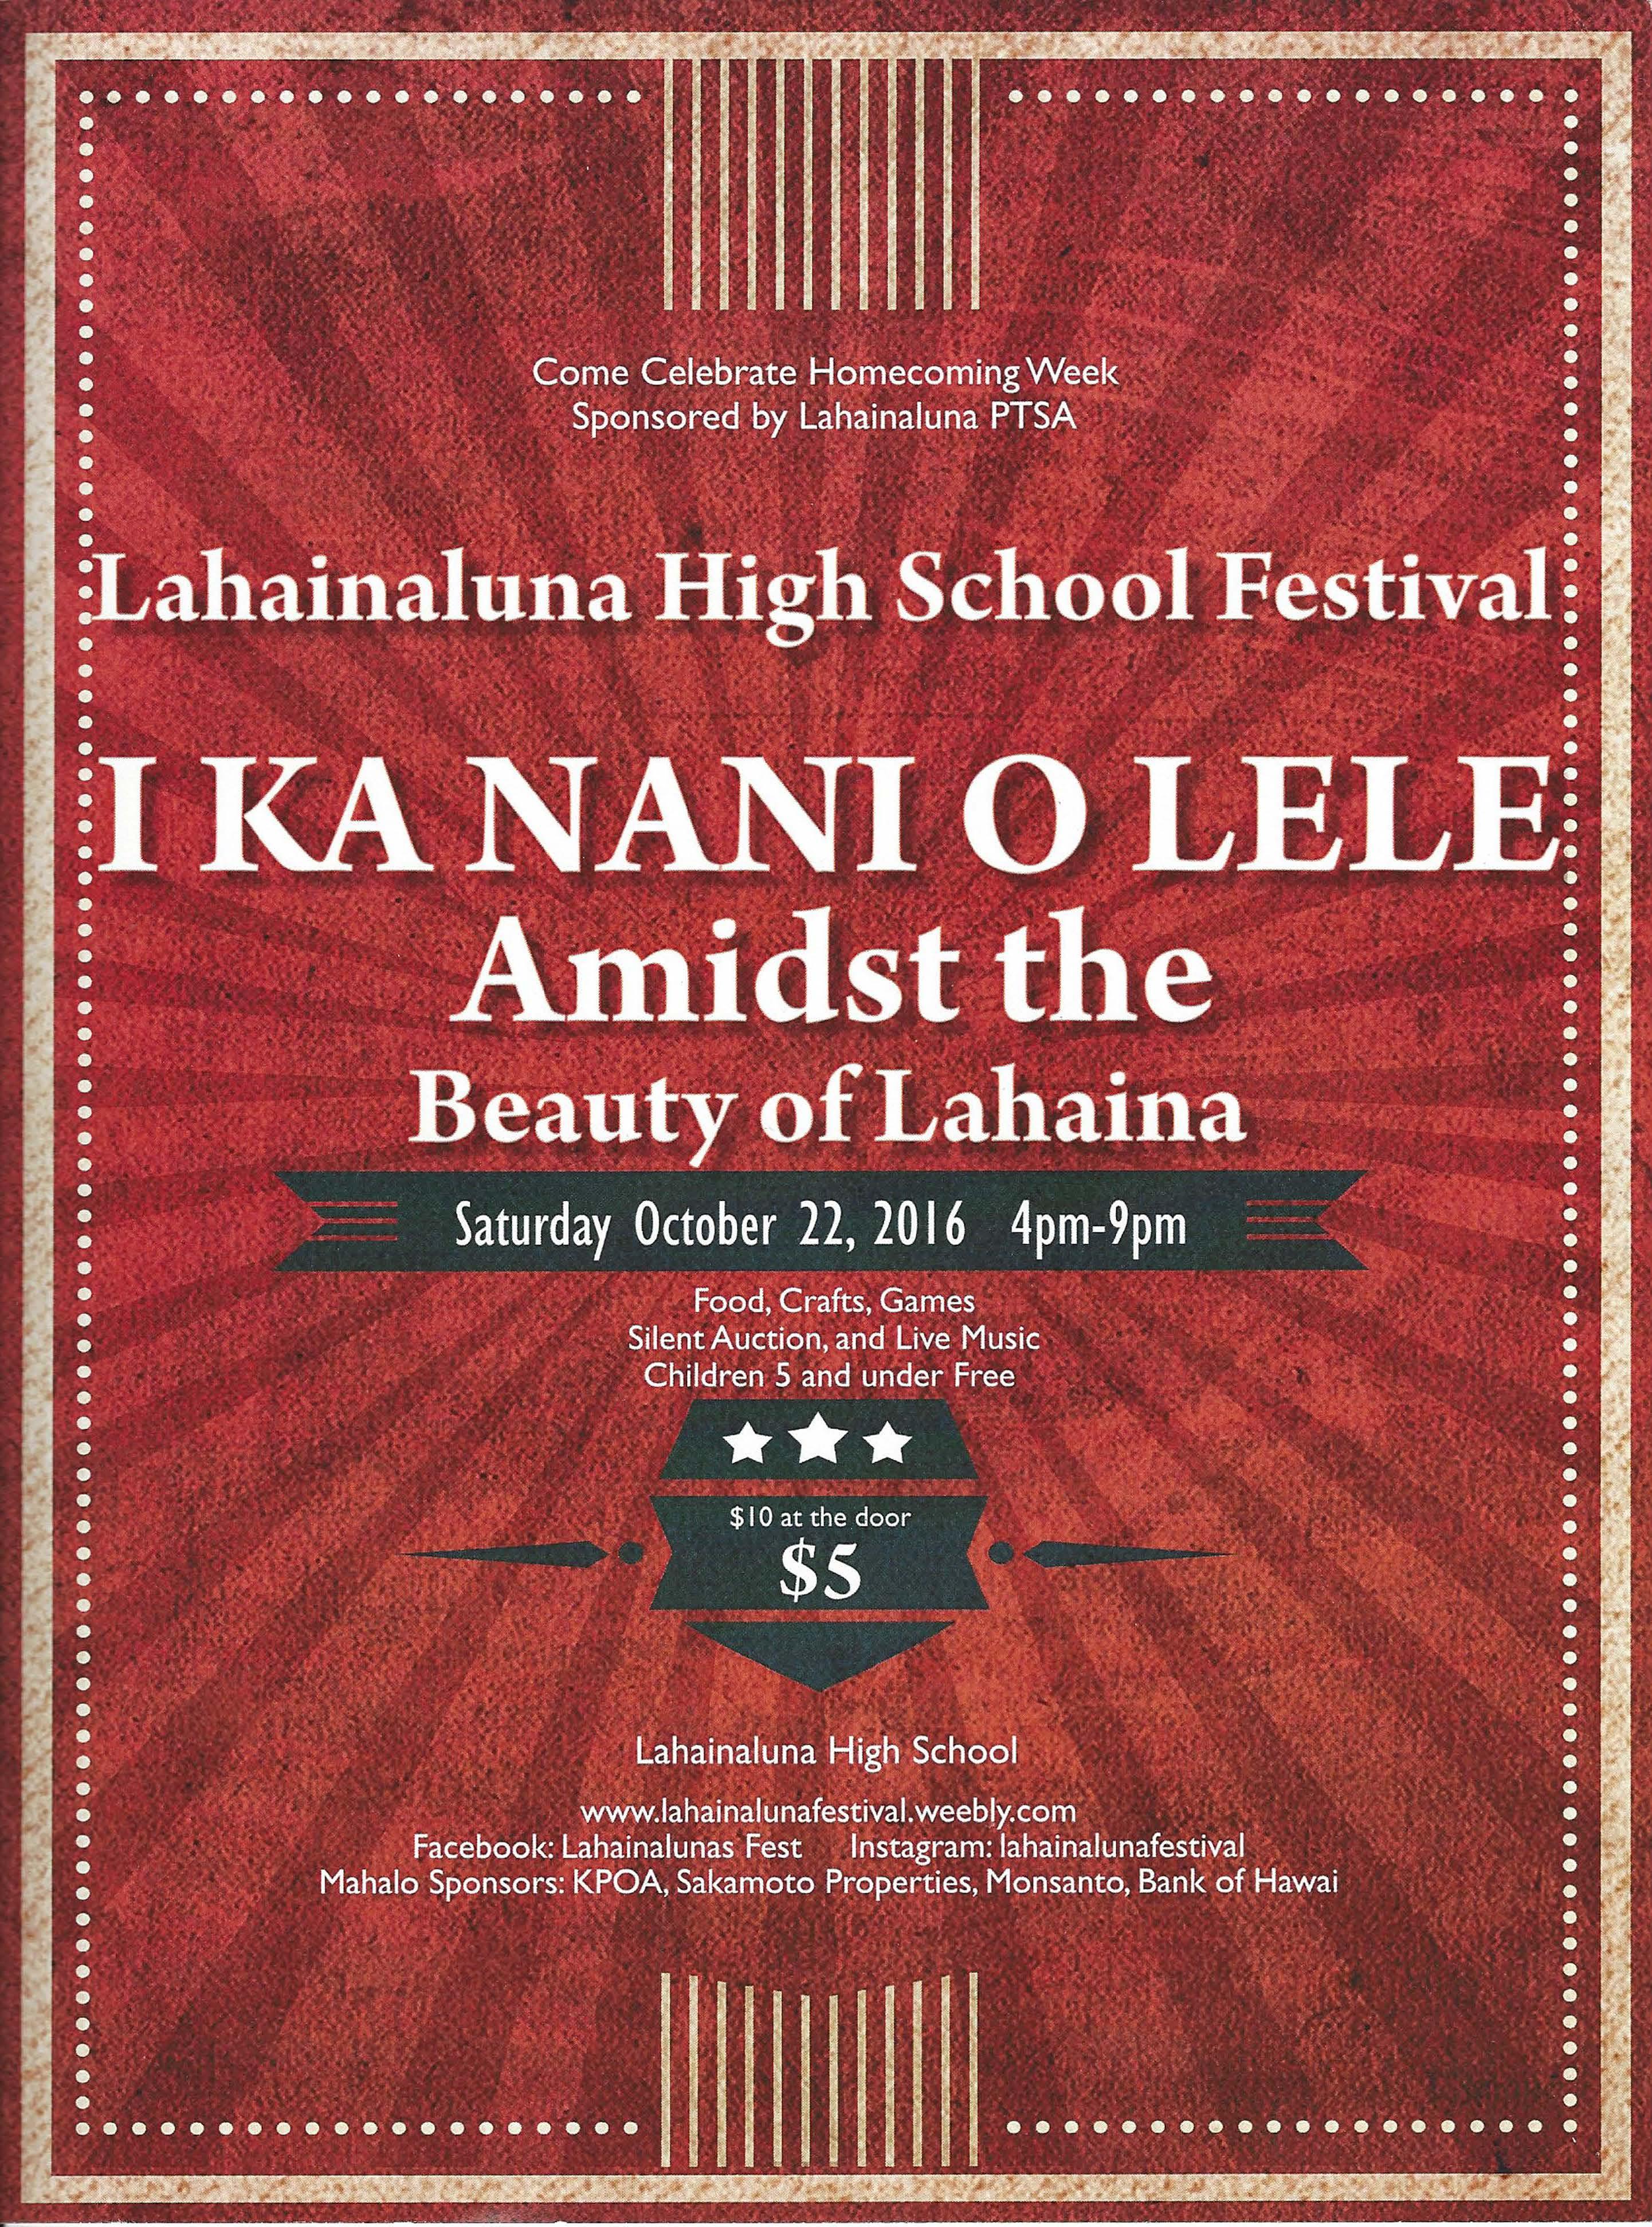 Lahainaluna Festival event flyer.